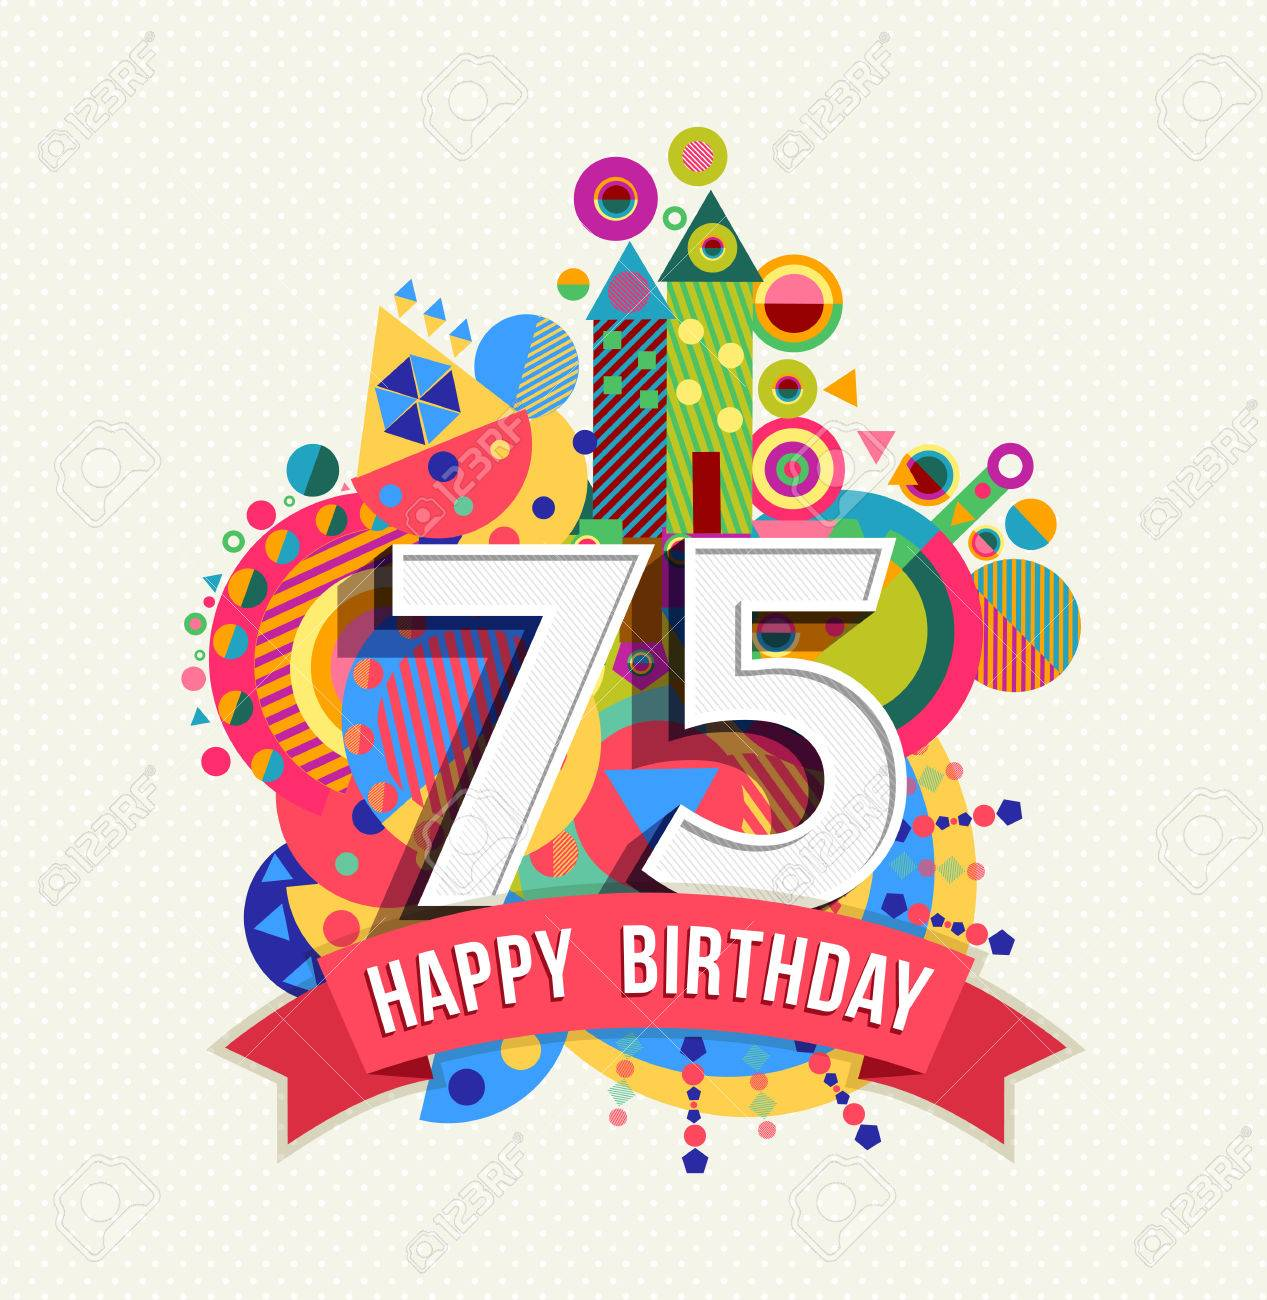 happy birthday seventy five 75 year fun celebration greeting